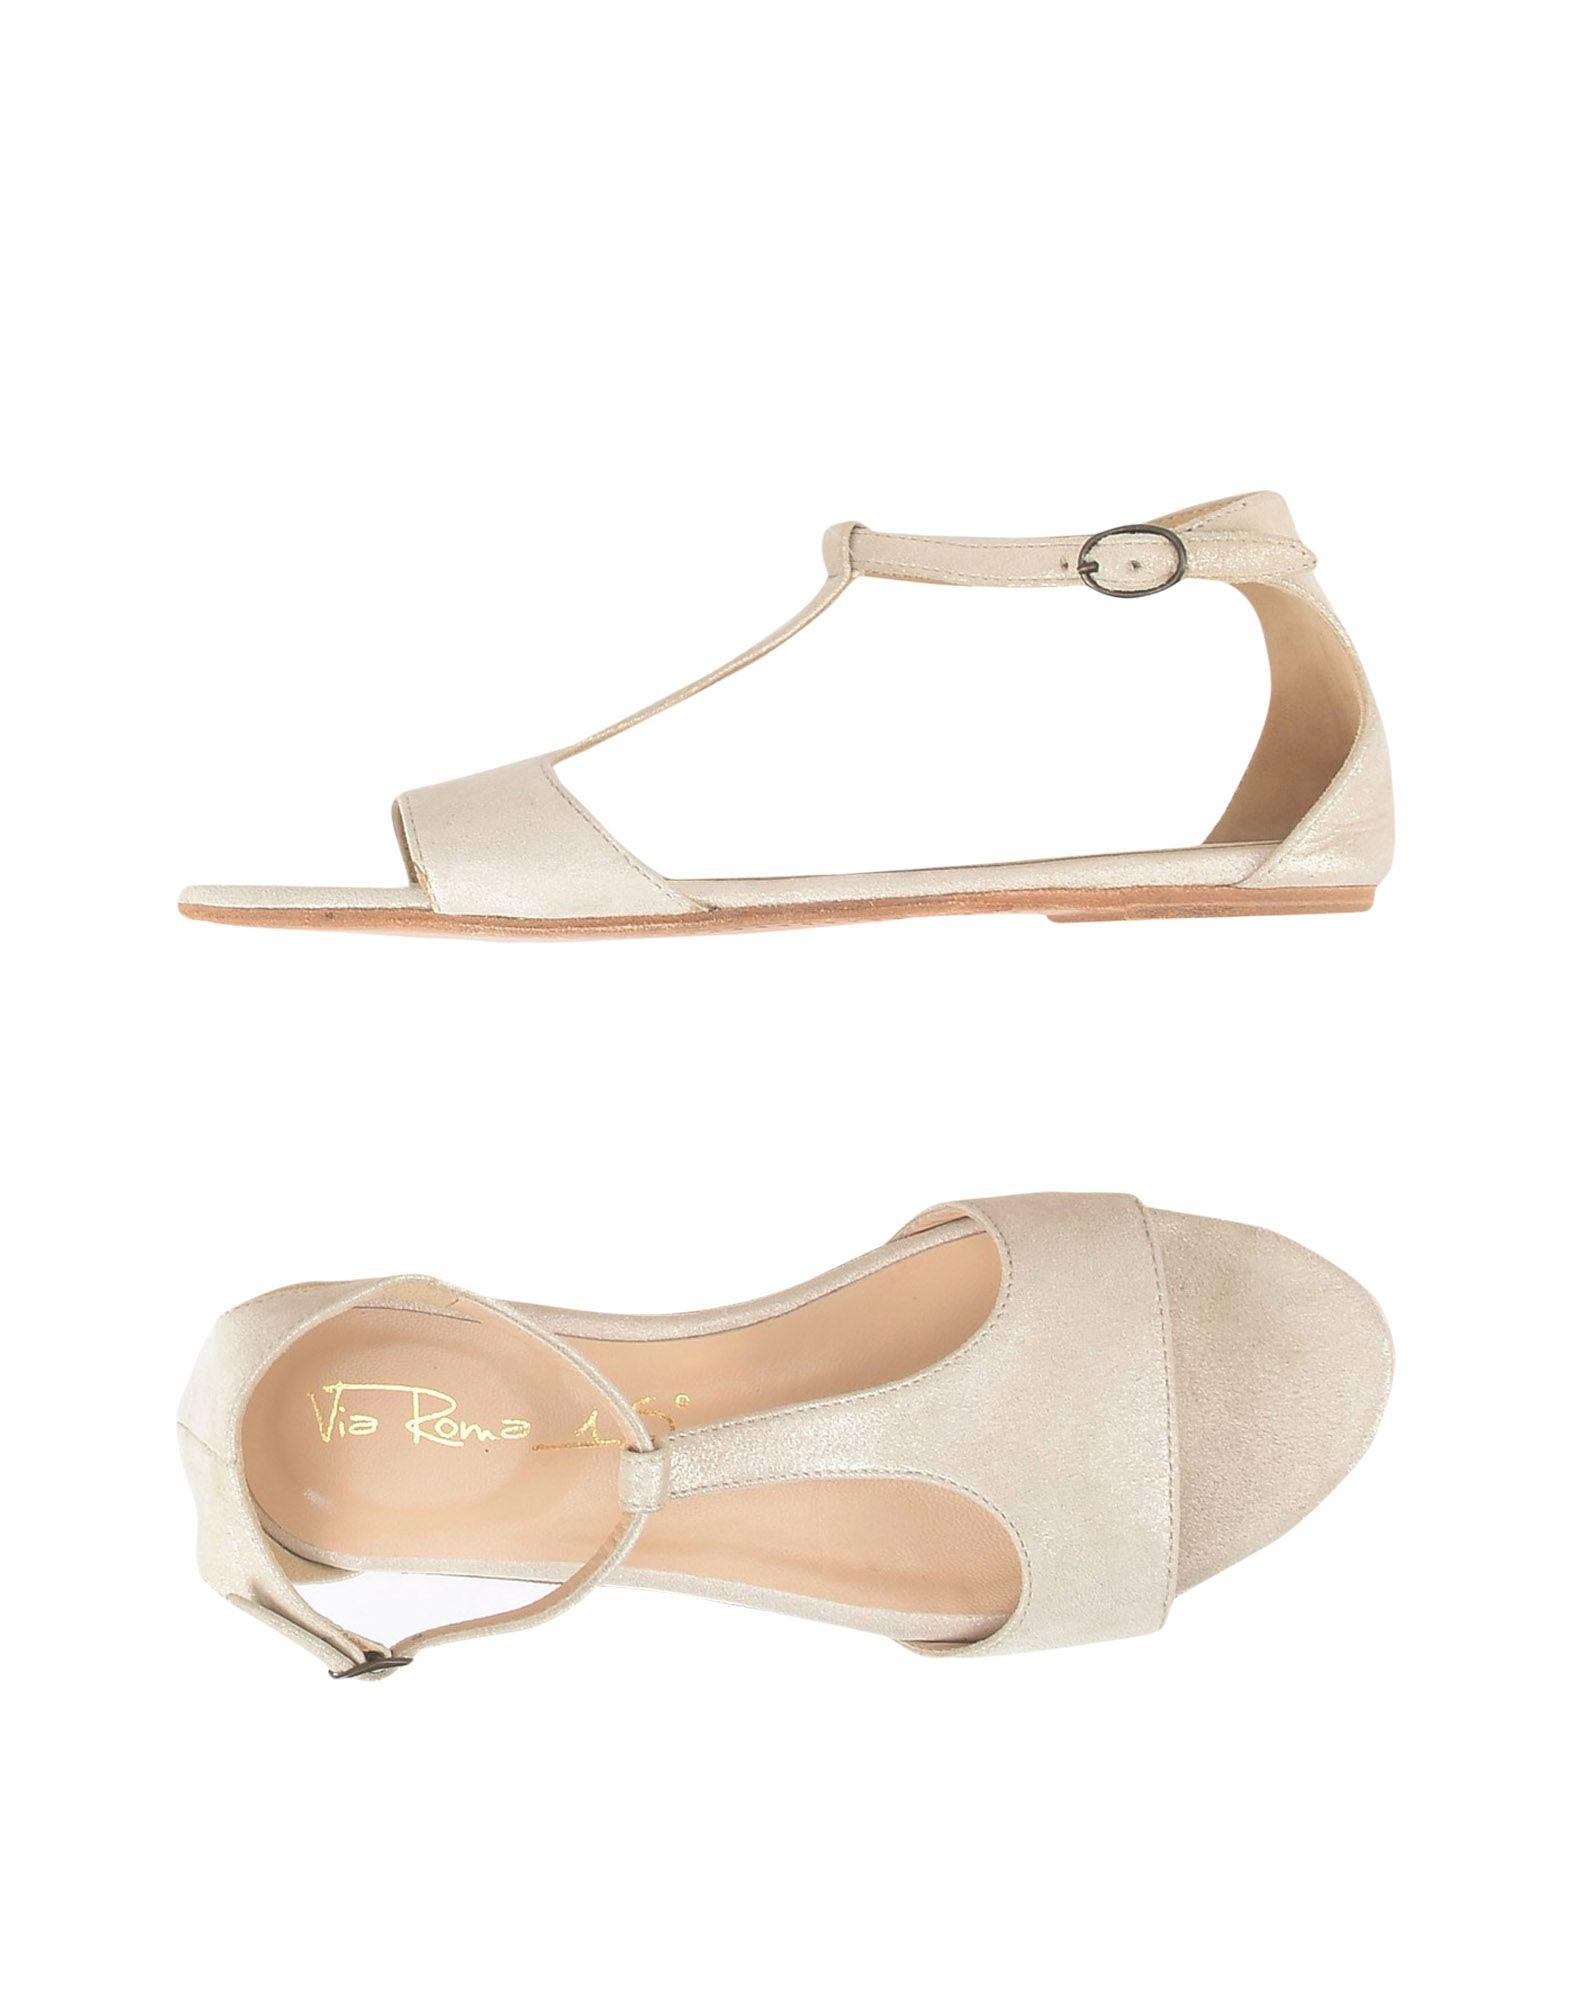 Via Roma 15 Sandalen Damen  11430854HB Gute Qualität beliebte Schuhe